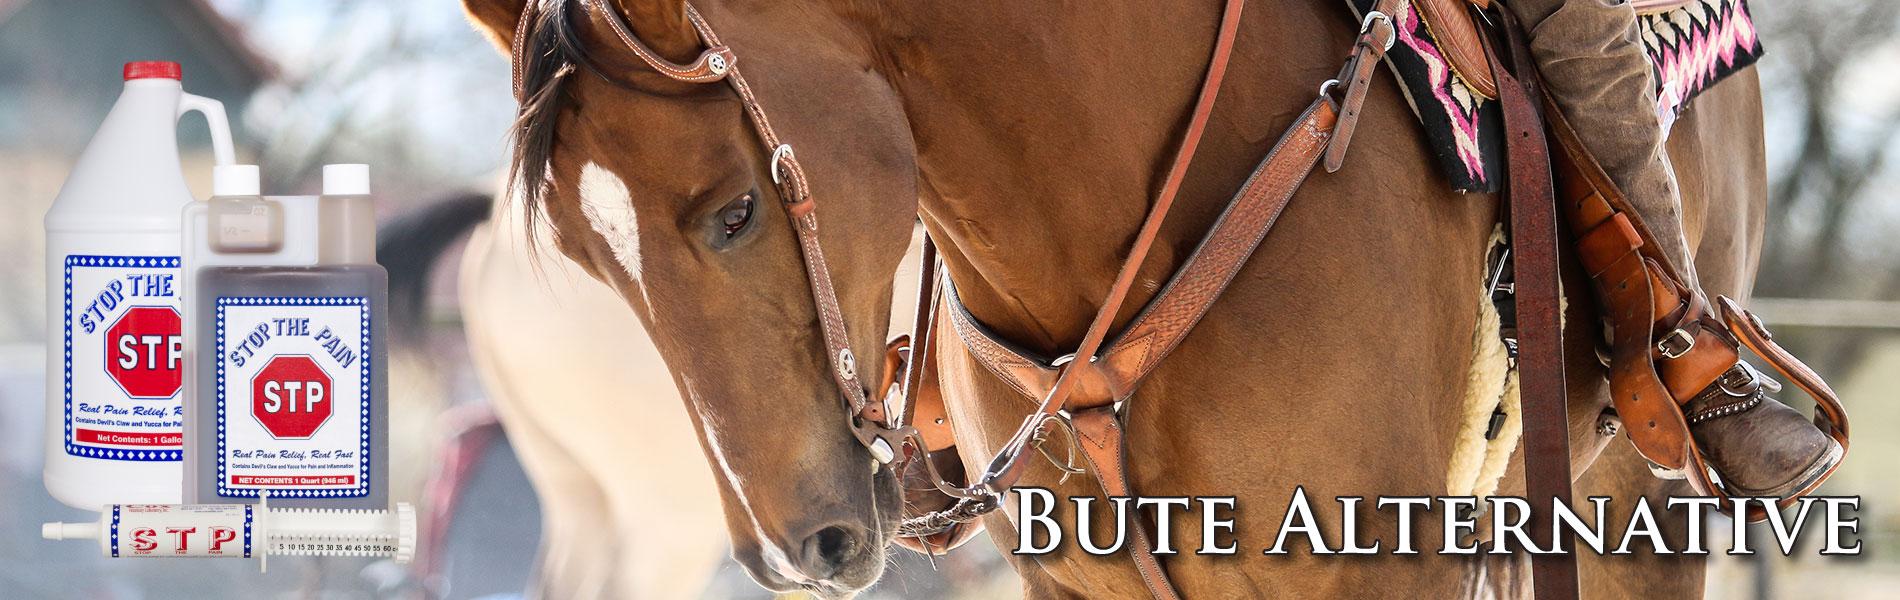 cox-vet-lab-horse-bute-natural-alternative